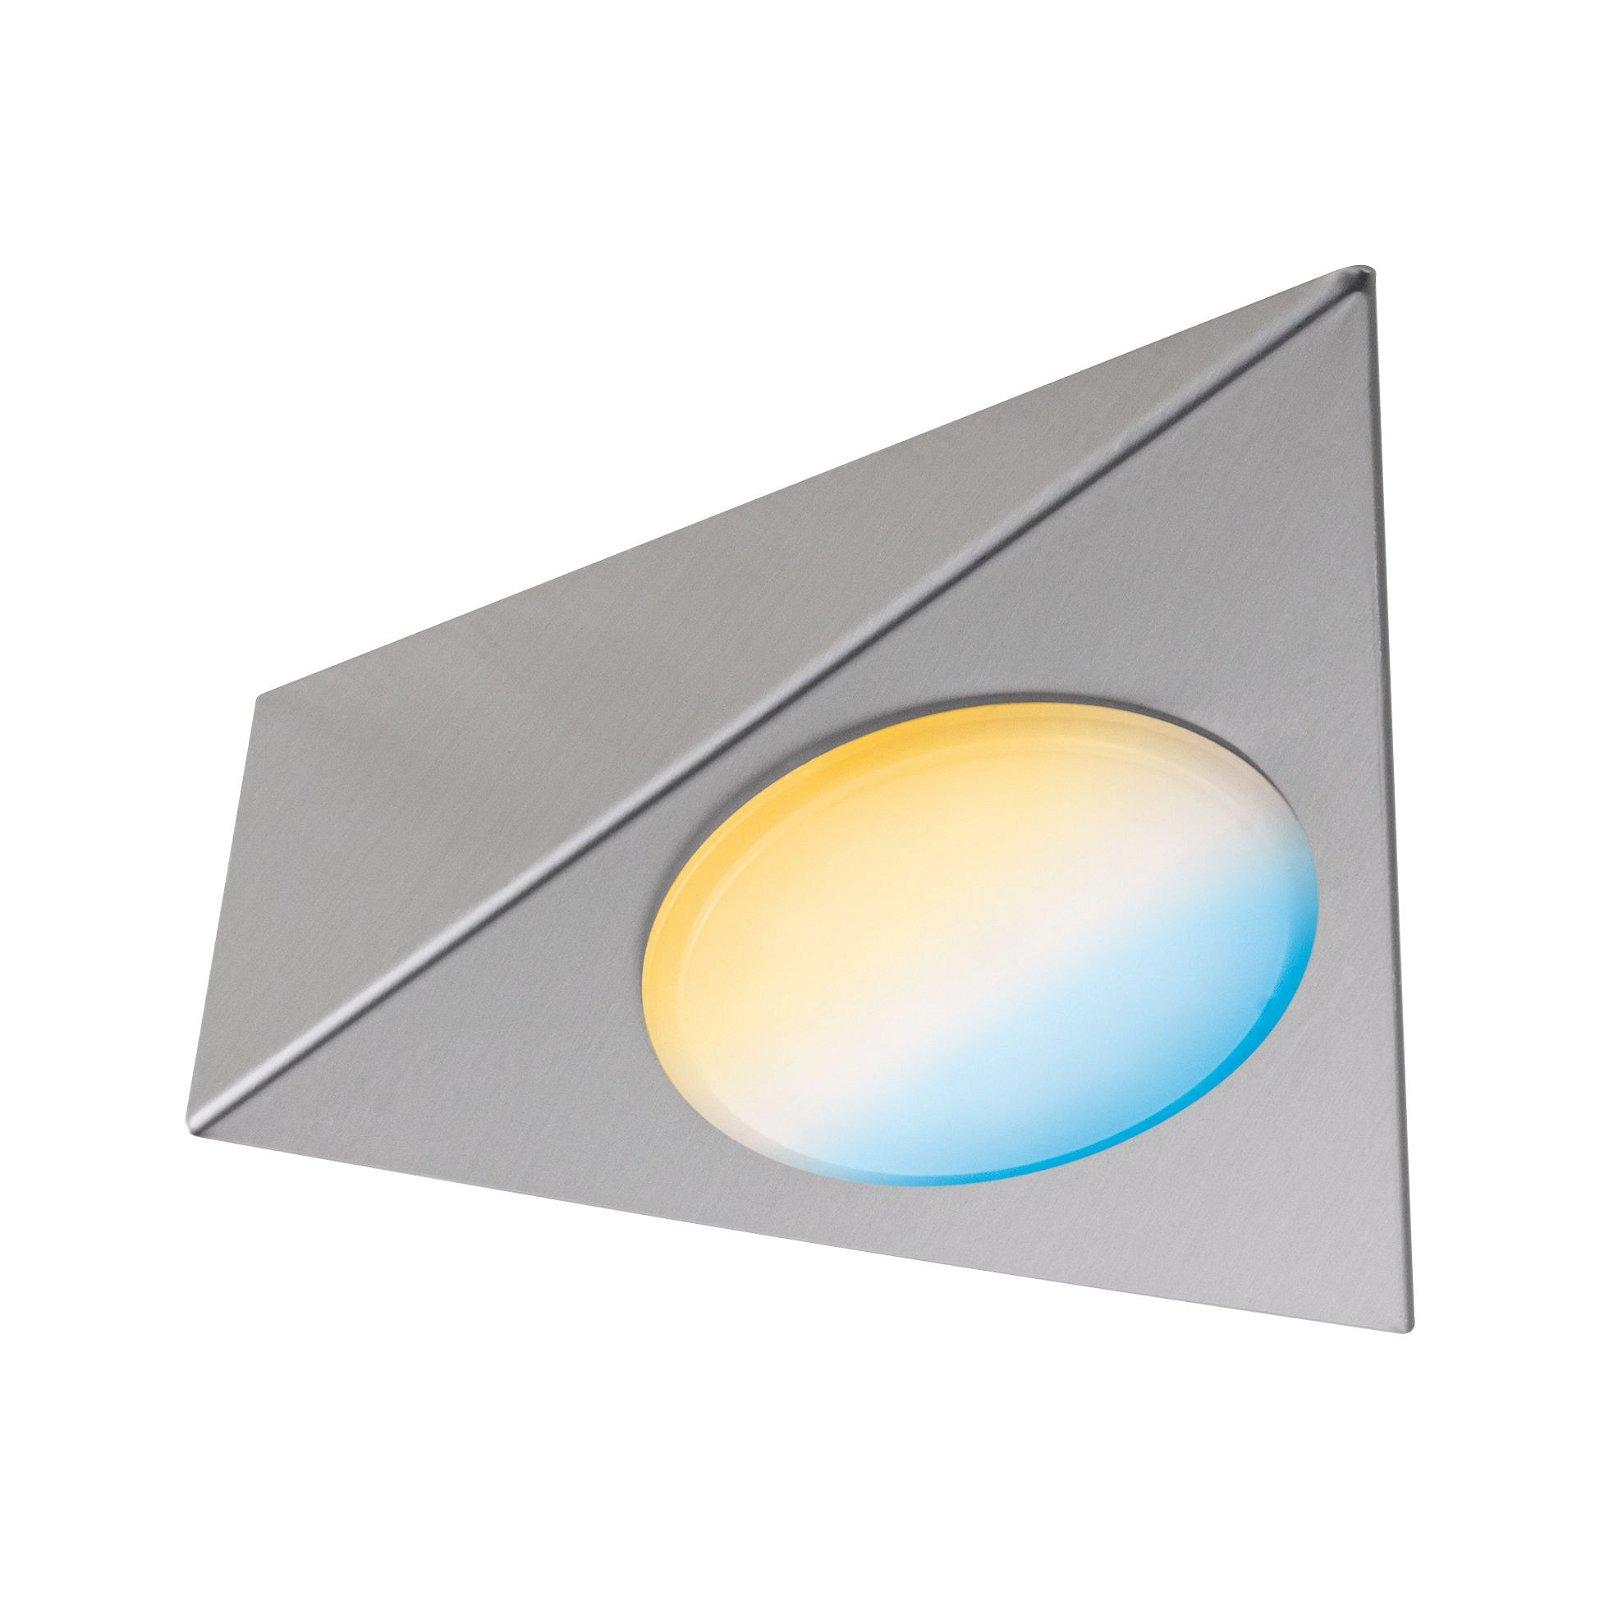 Clever Connect LED Spot Trigo Tunable White 2,1W Nickel gebürstet